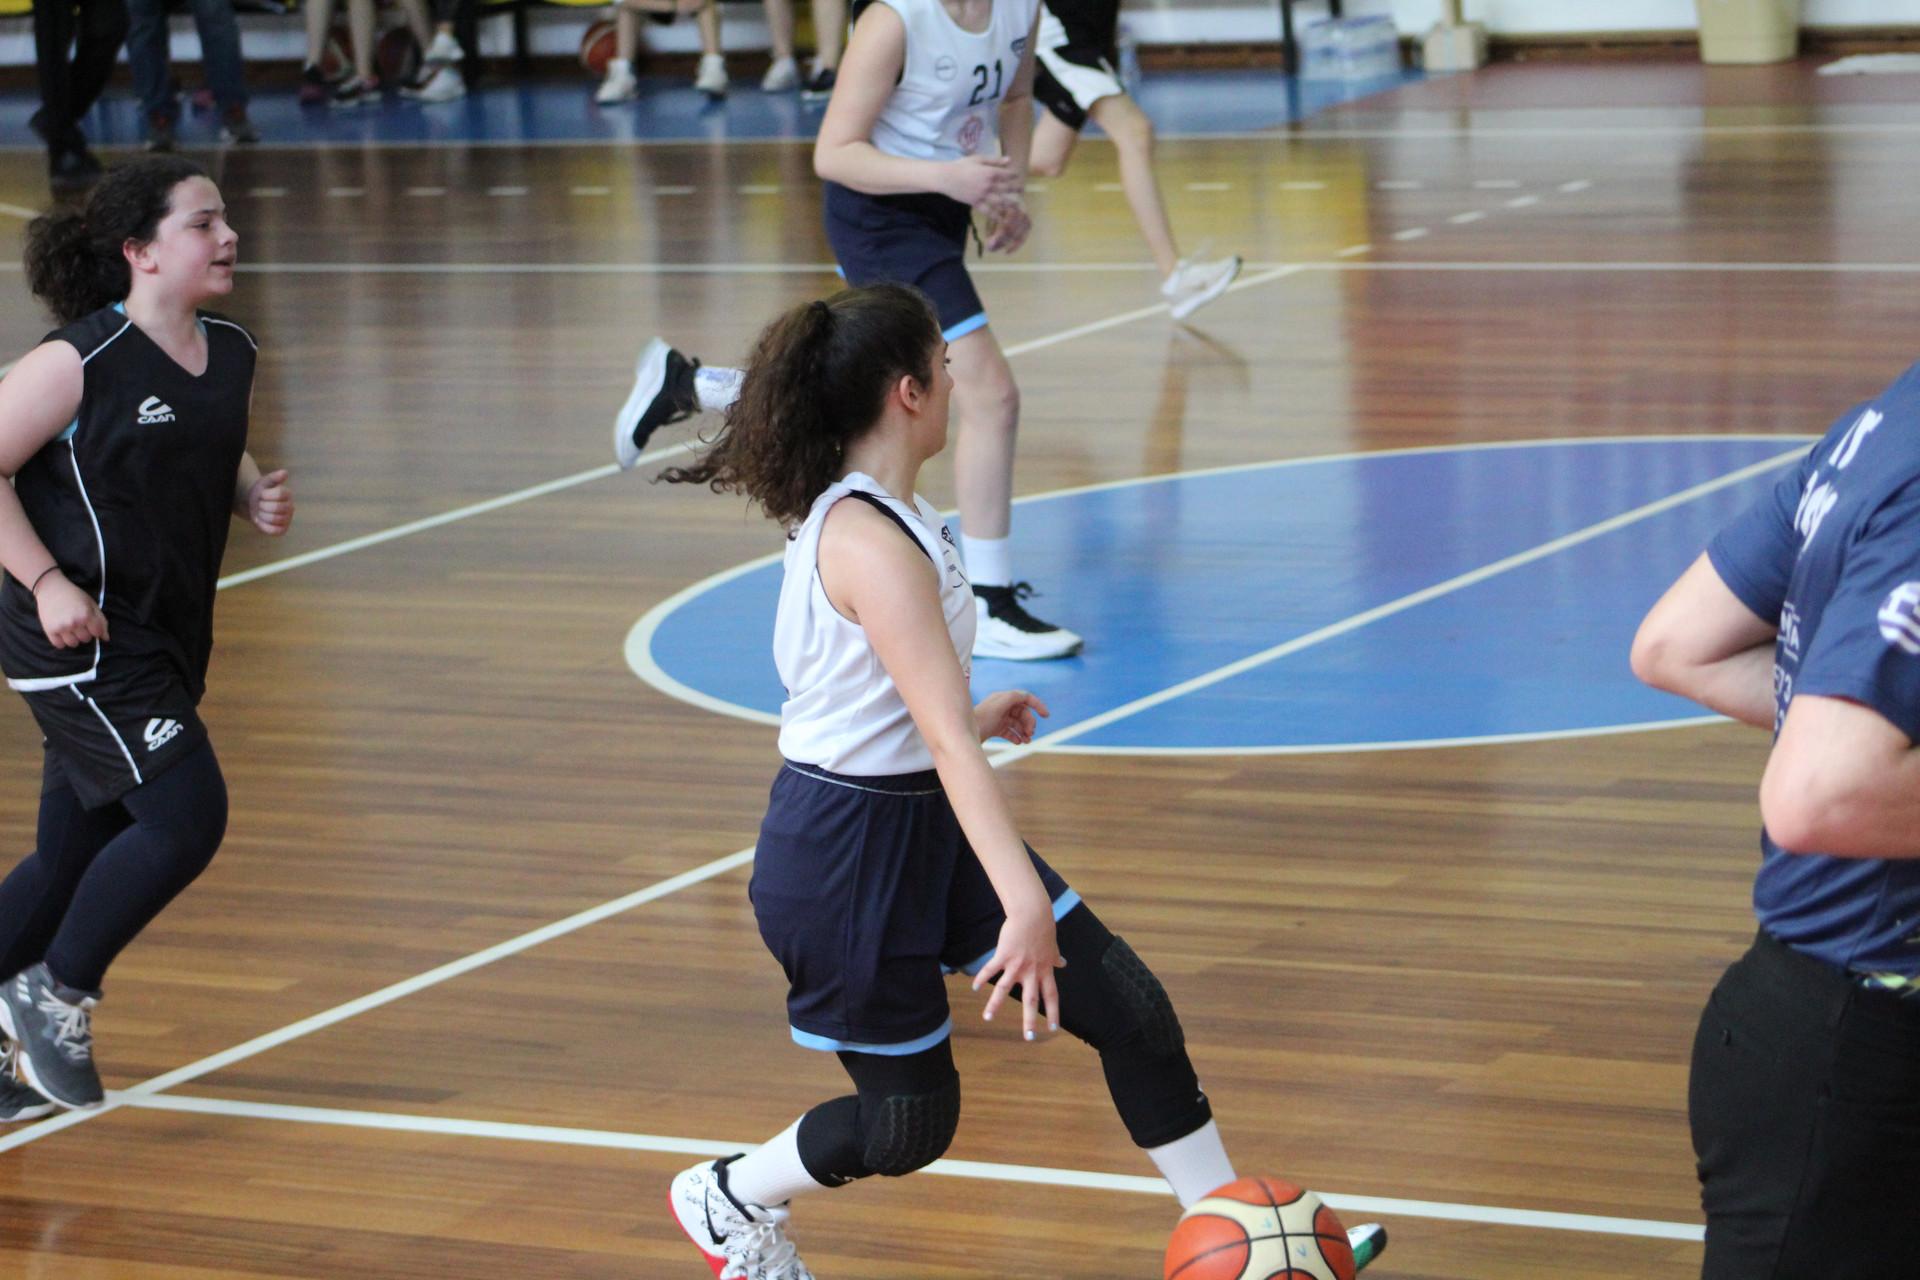 super-league-athletic-academy-athens-tour-2019-day-1_40712430263_o